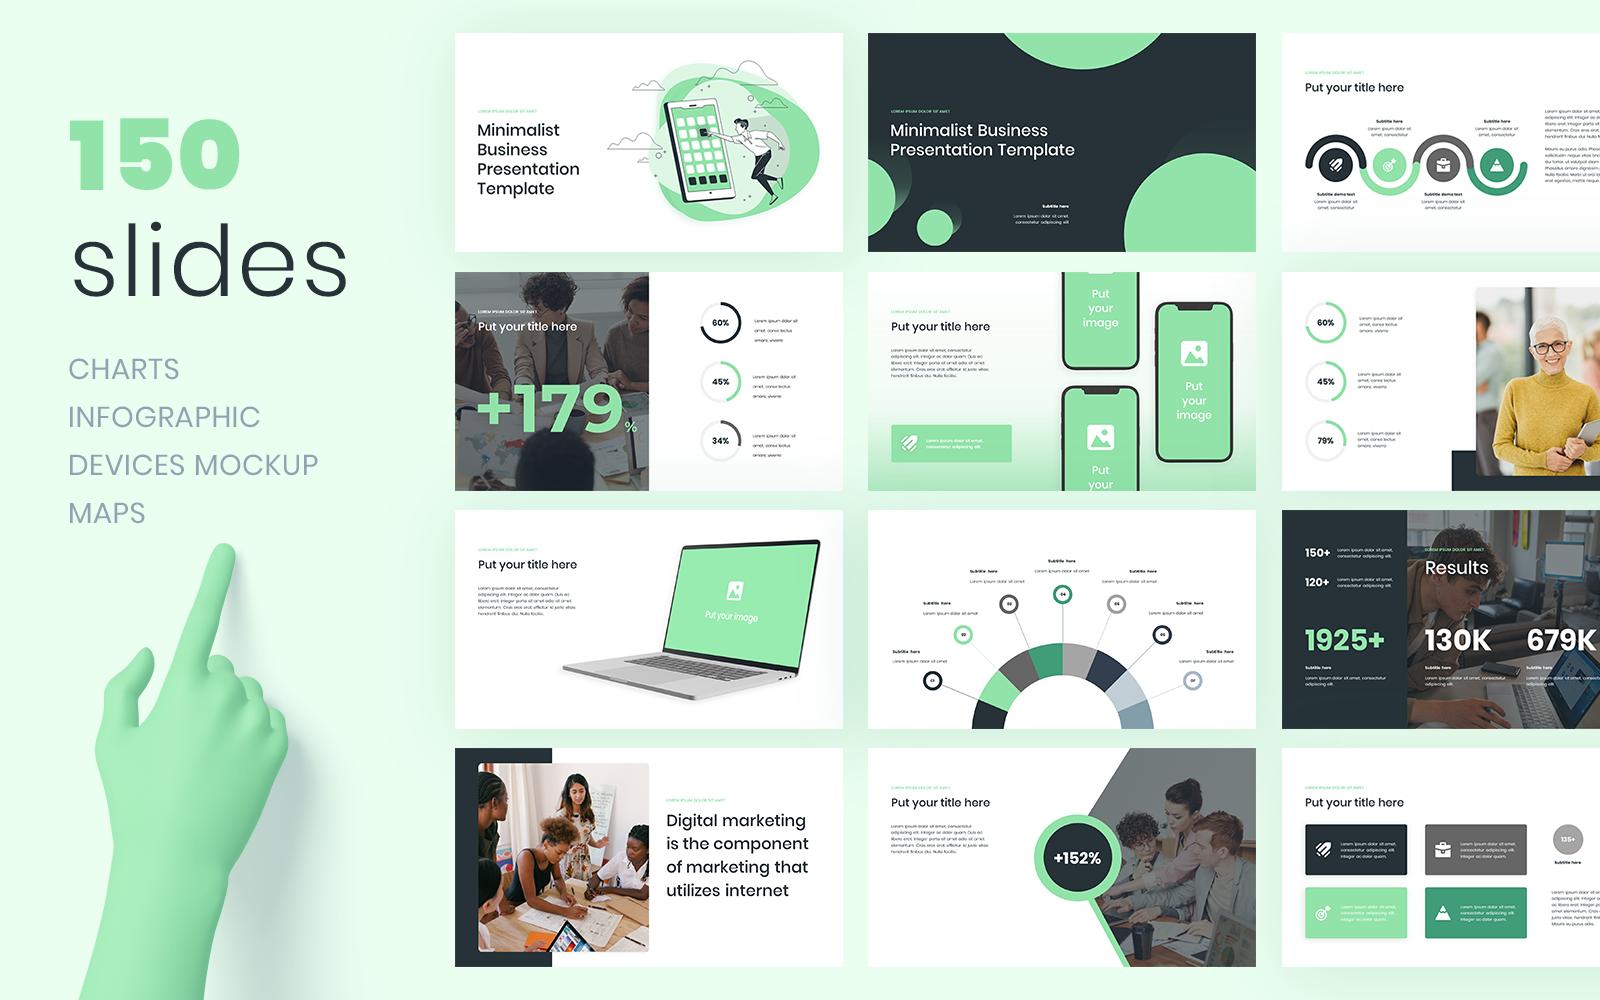 Minimalist Business PowerPoint Presentation Template